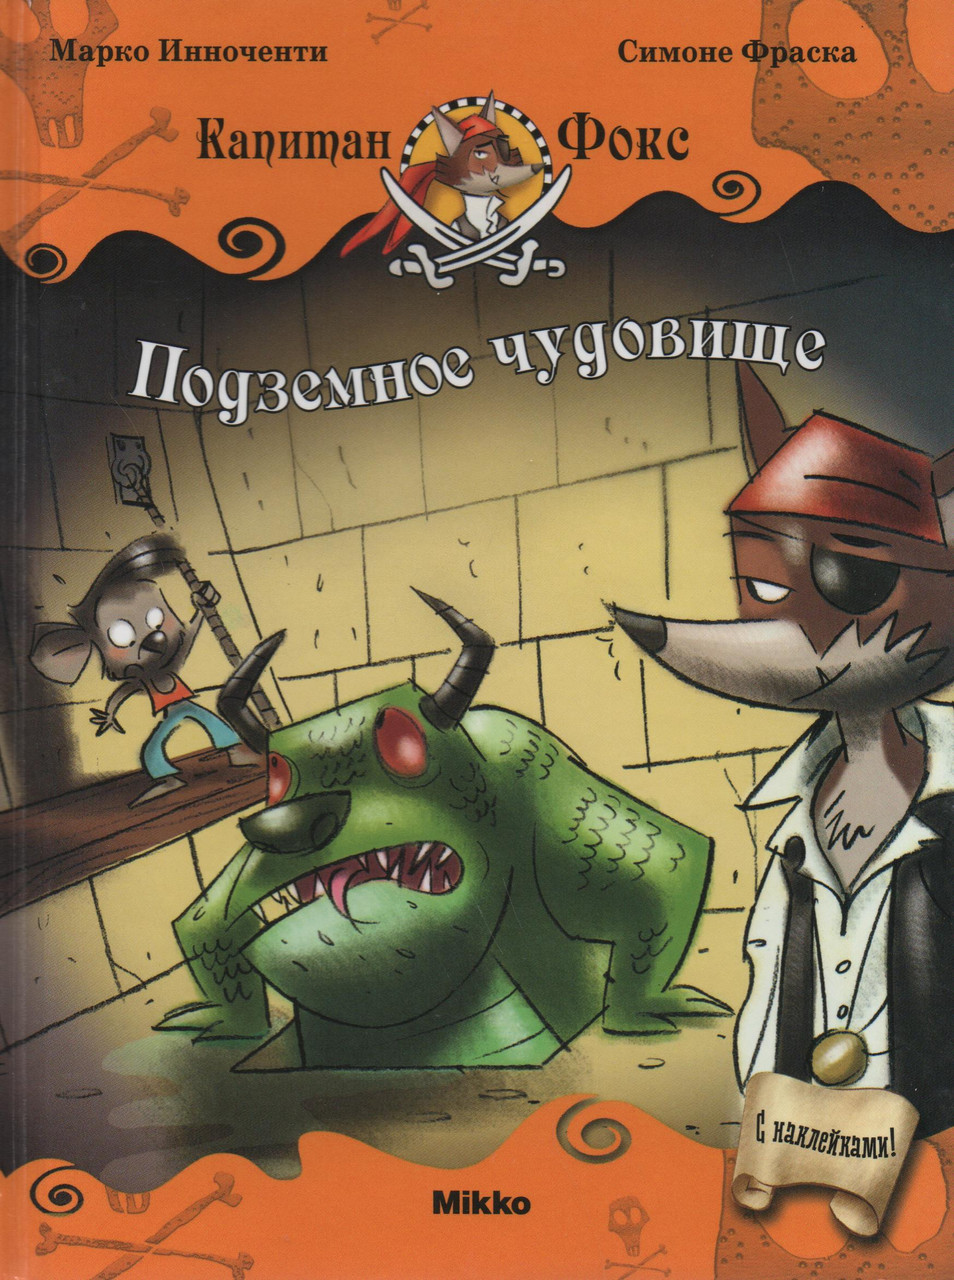 Подземное чудовище (книга-3). Марко Инноченти, Симоне Фраска